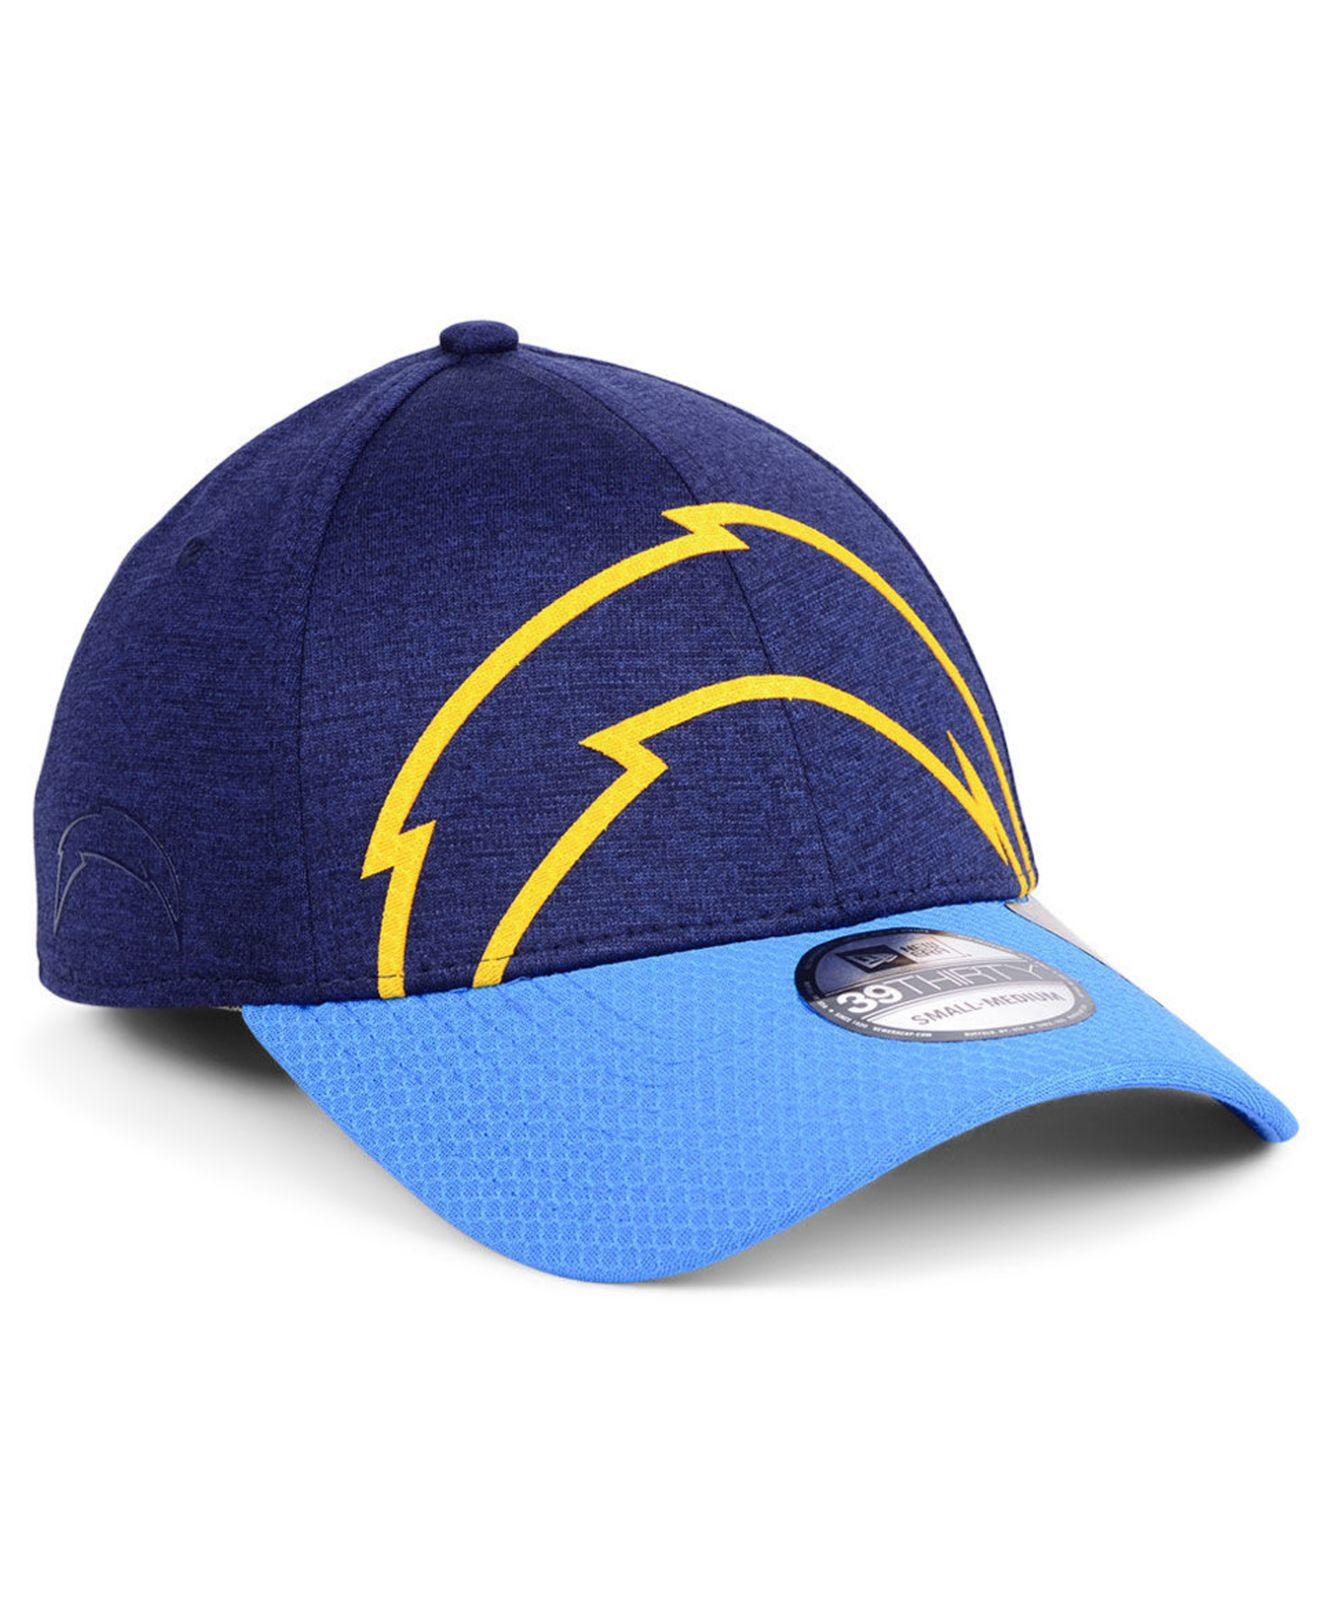 6debeb83626 KTZ. Men s Blue Los Angeles Chargers Oversized Laser Cut Logo 39thirty Cap